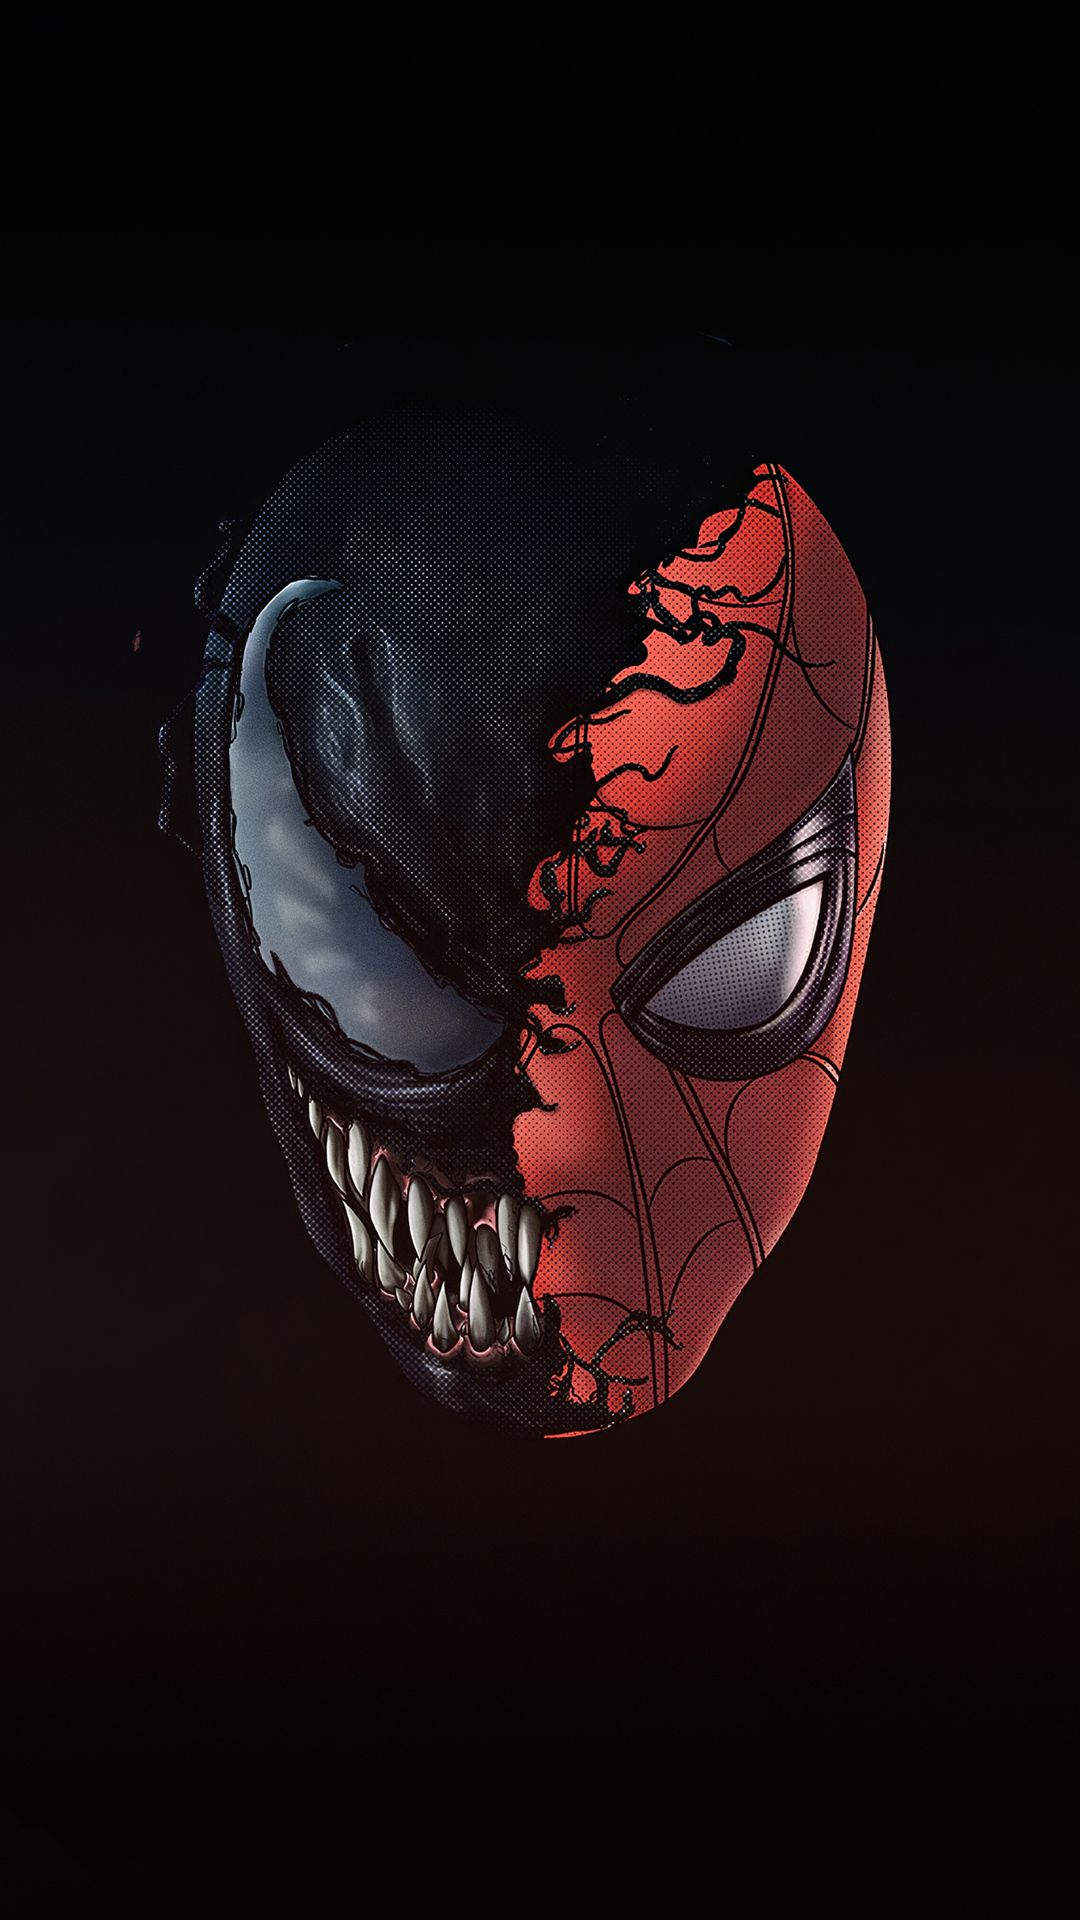 Spiderman X Venom Mobile Wallpaper Marvel Spiderman Art Marvel Wallpaper Superhero Wallpaper